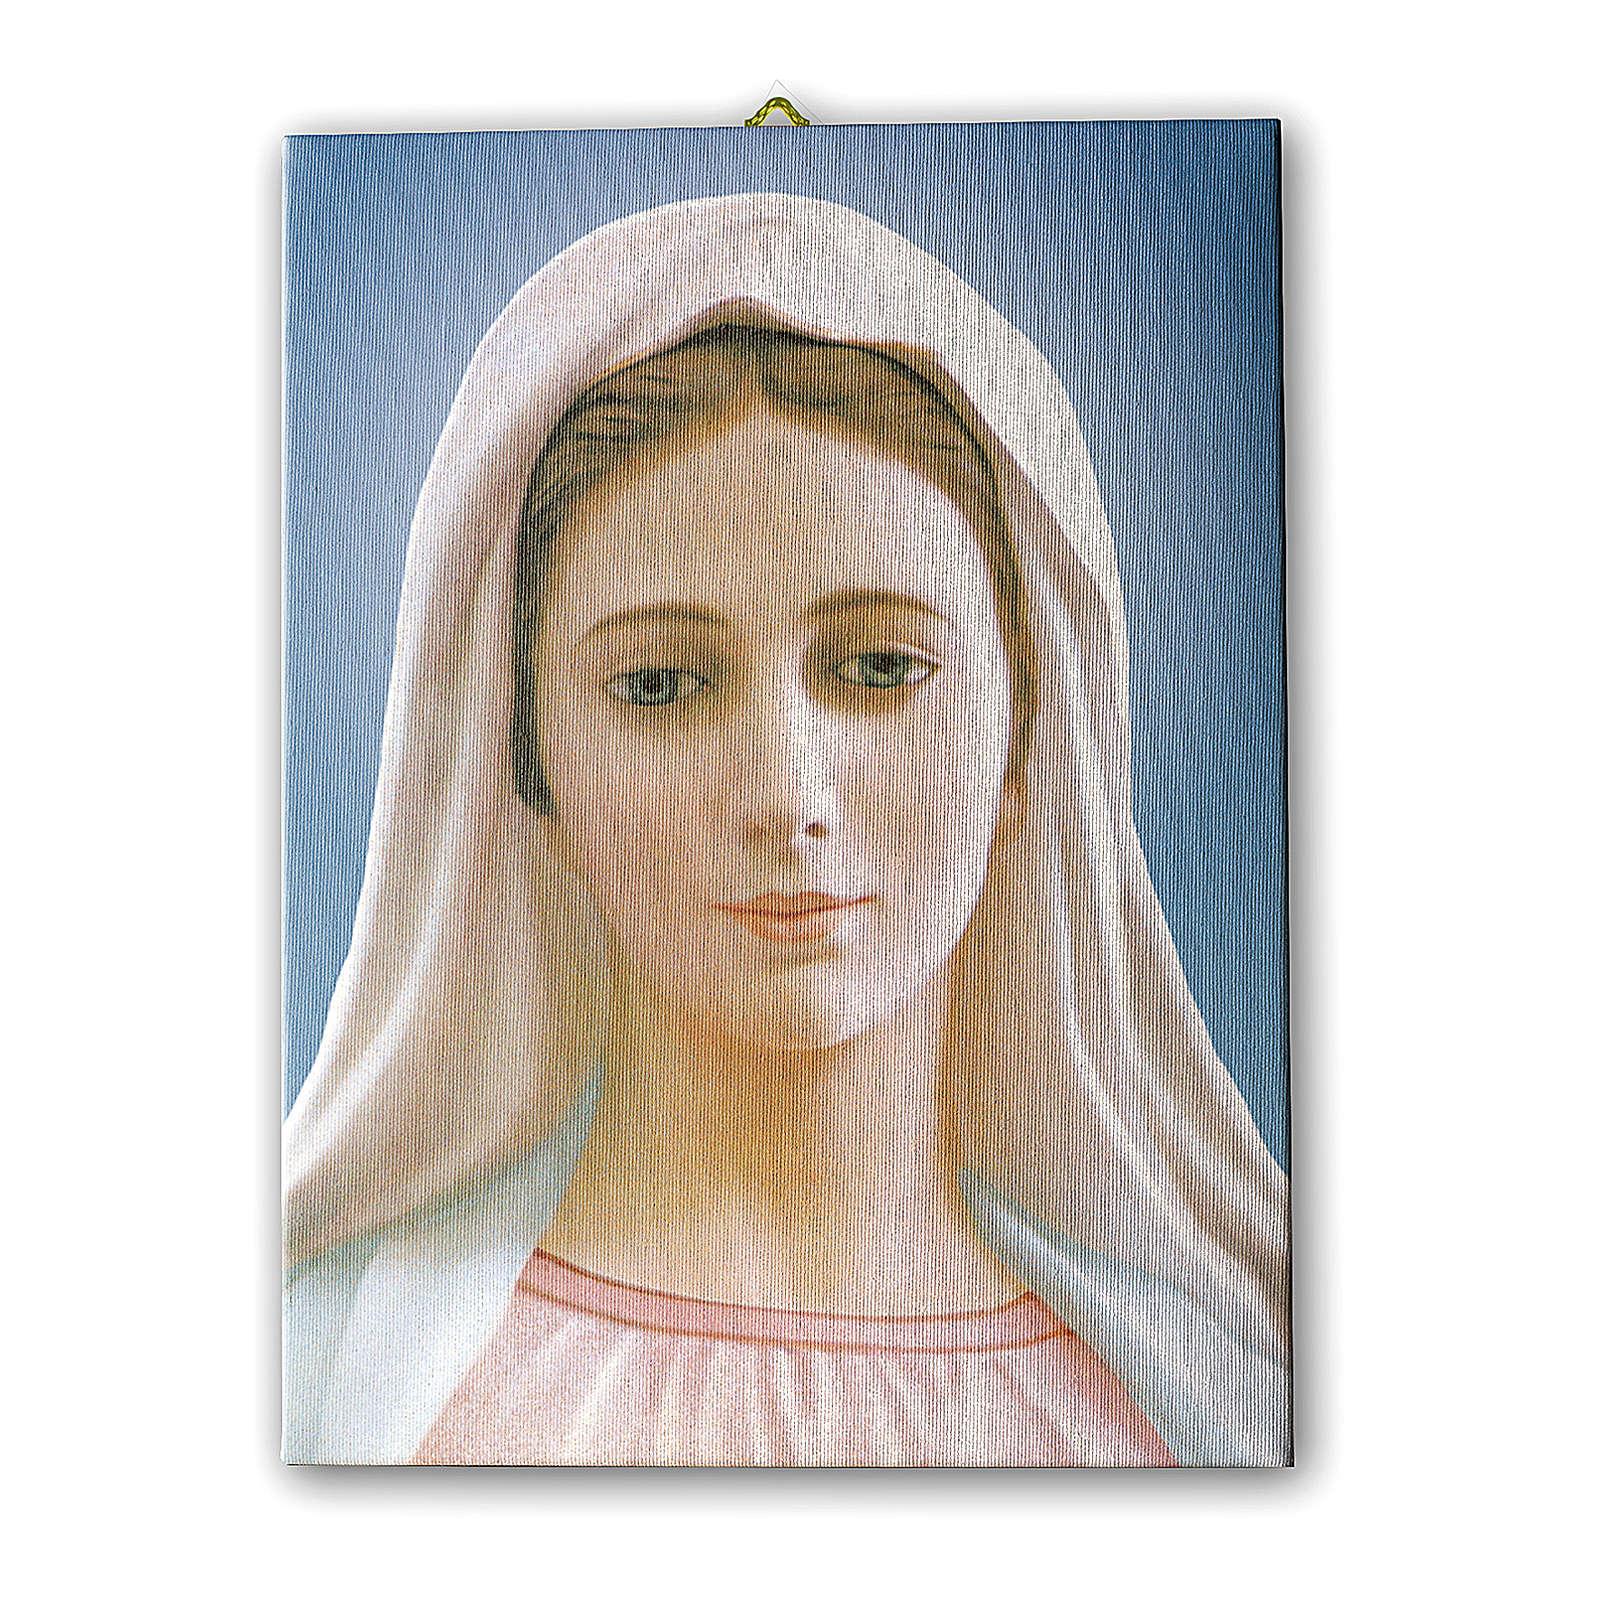 Cuadro sobre tela pictórica Virgen de Medjugorje 40x30 cm 3